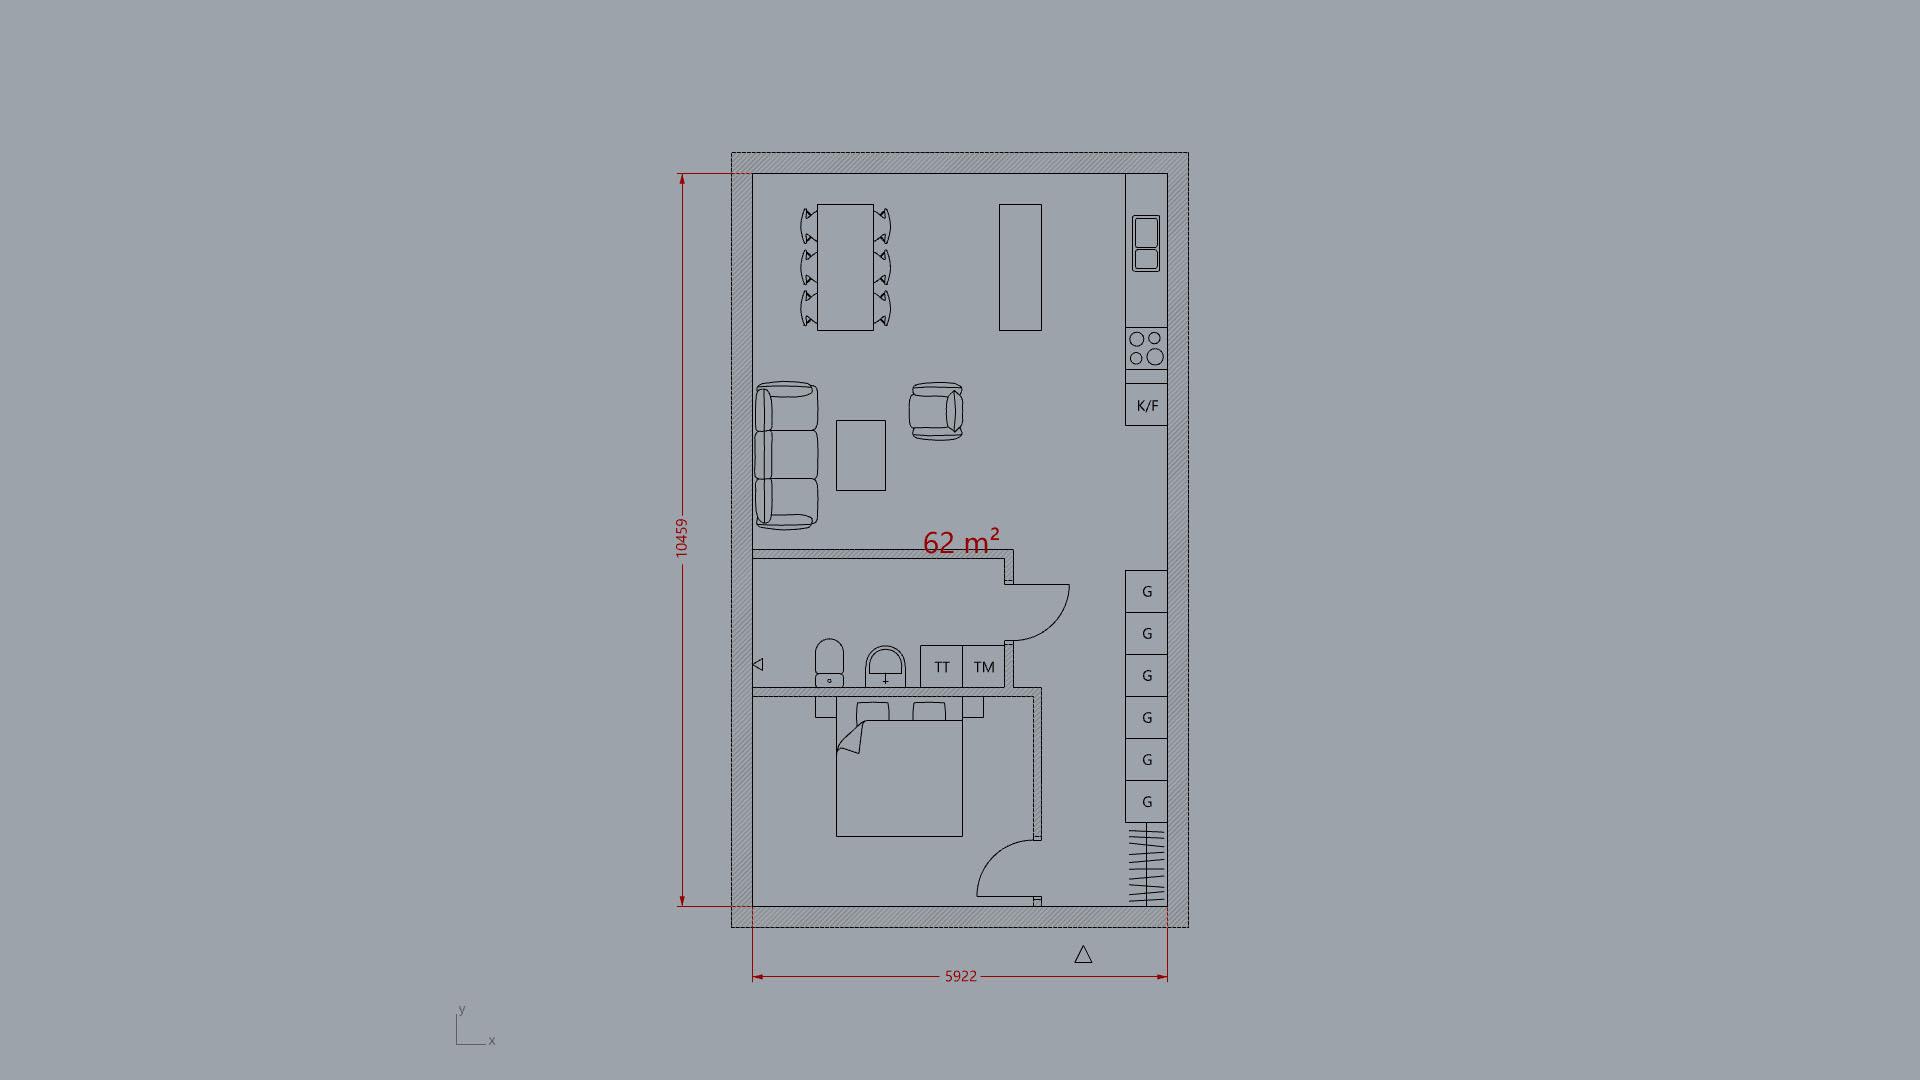 Parametric Tool Finch Can Generate Adaptive Floor Plans